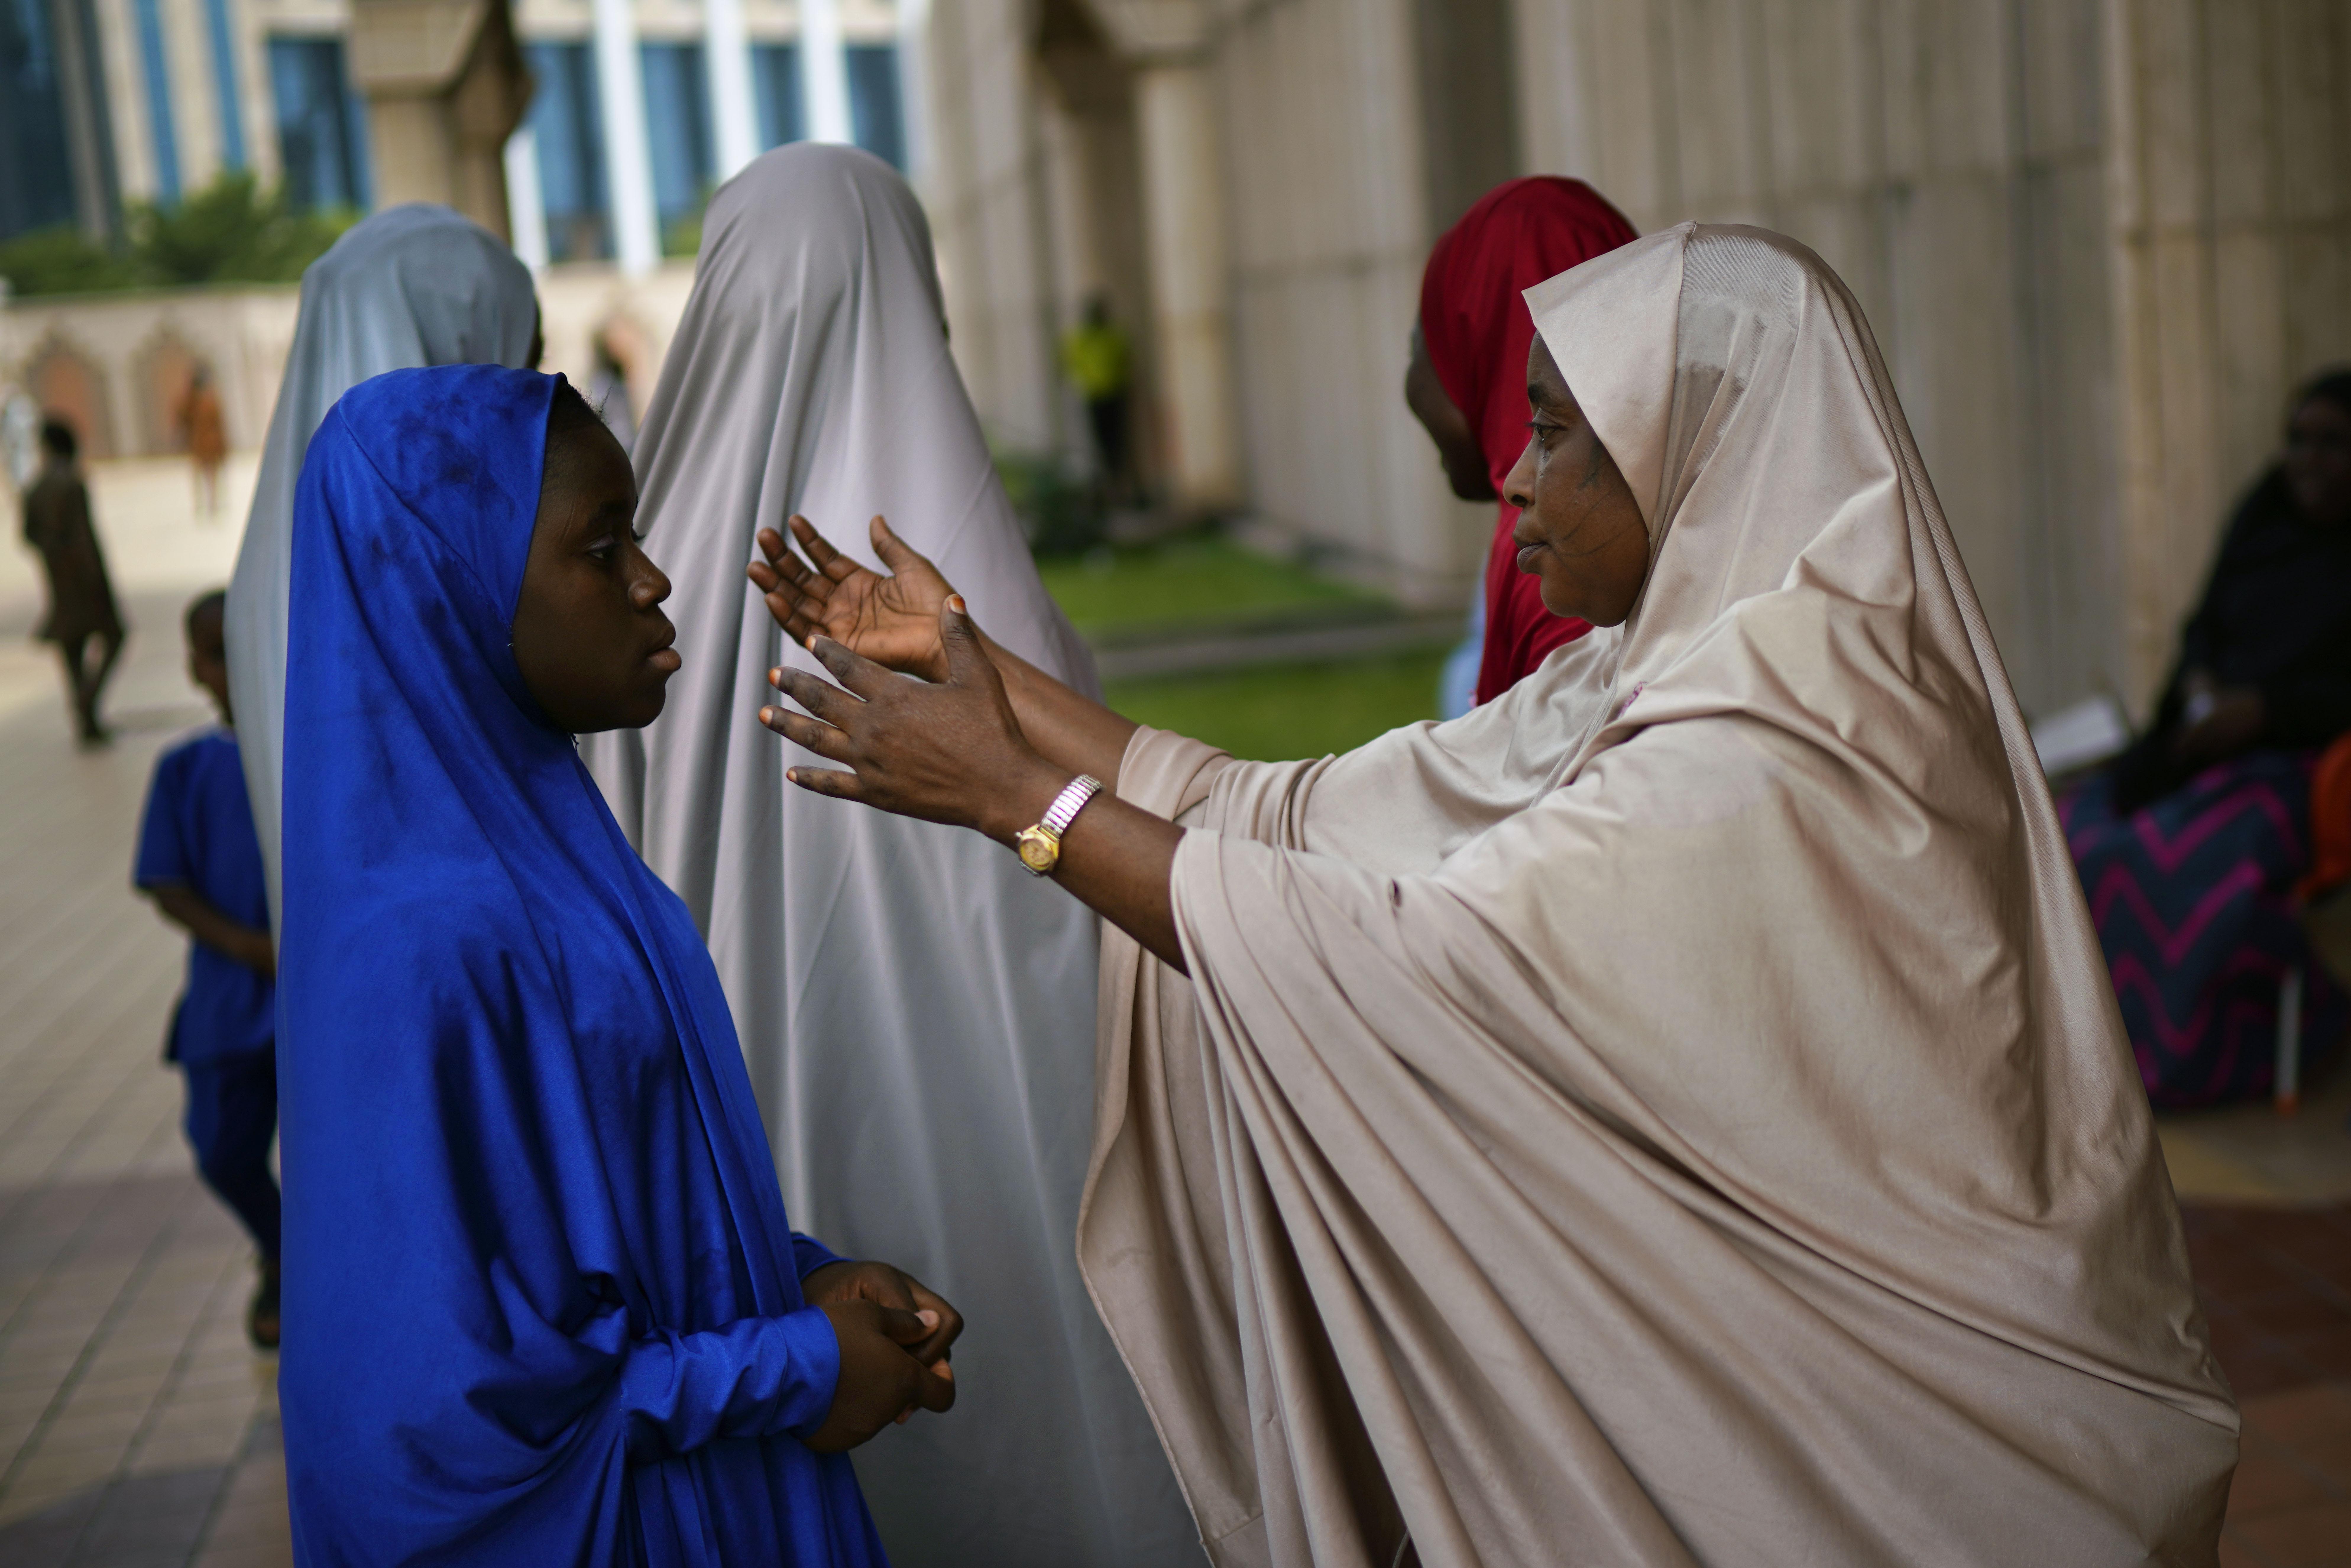 Nigeria delays election until Feb. 23 over 'challenges'